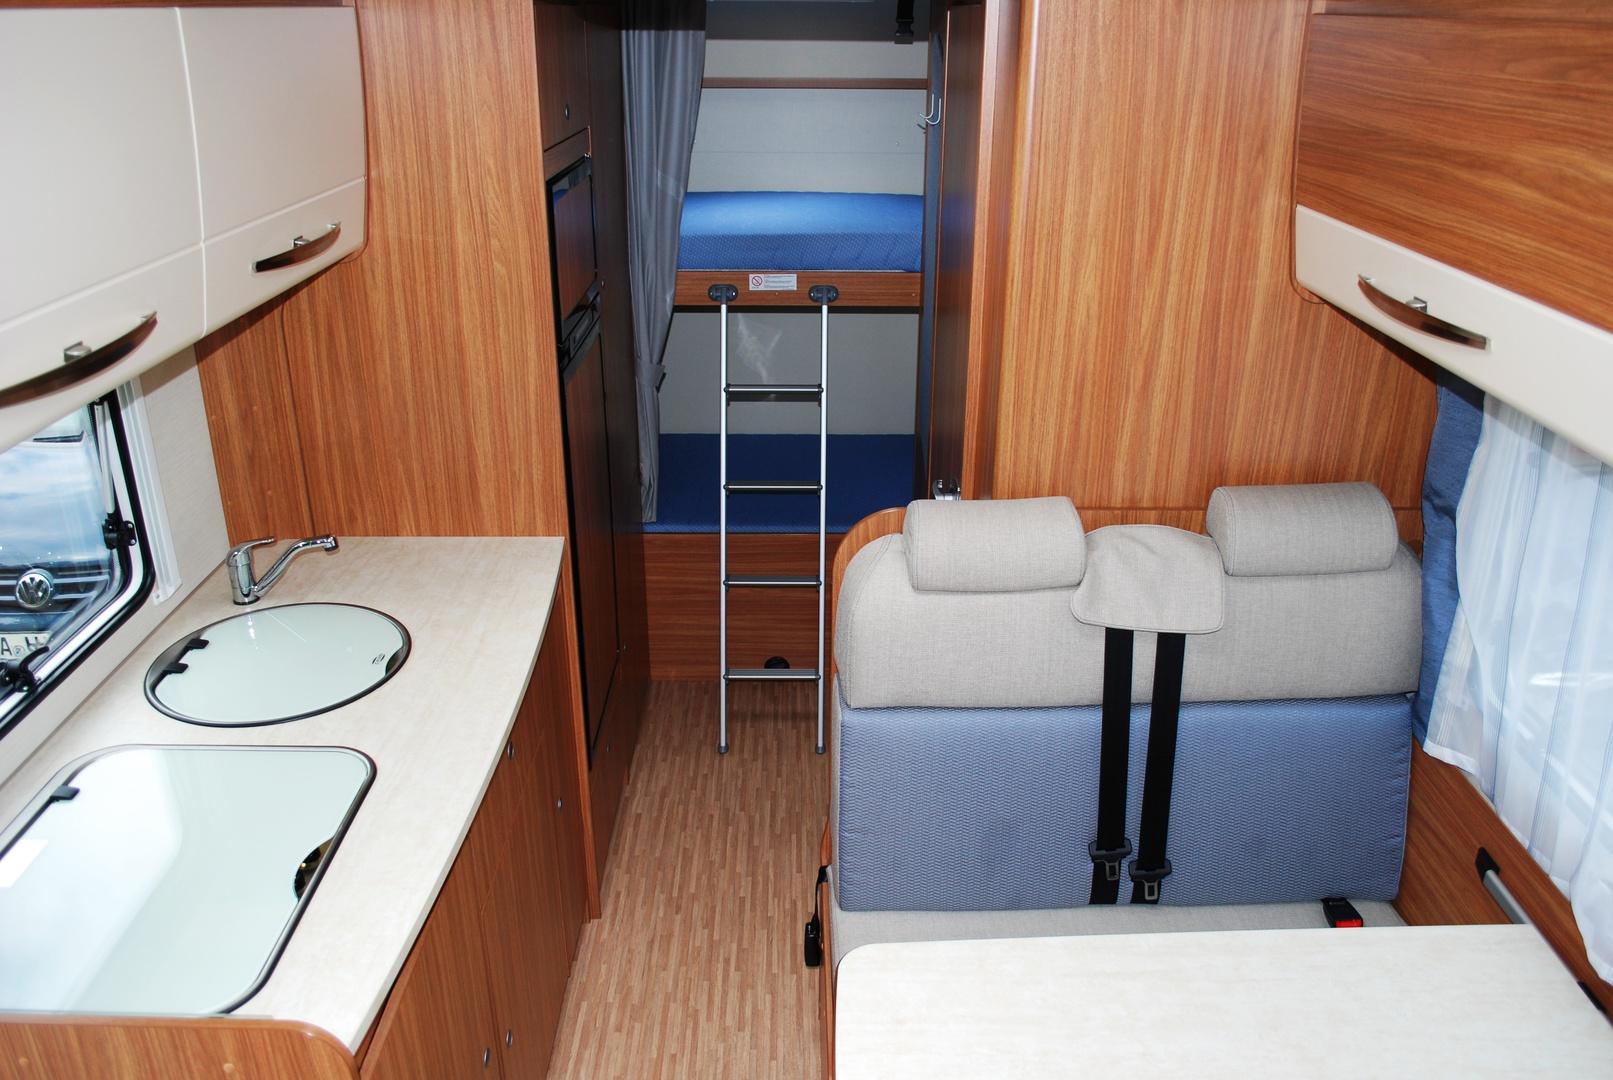 wohnmobilvermietung jell carado a 361 bj 2016. Black Bedroom Furniture Sets. Home Design Ideas